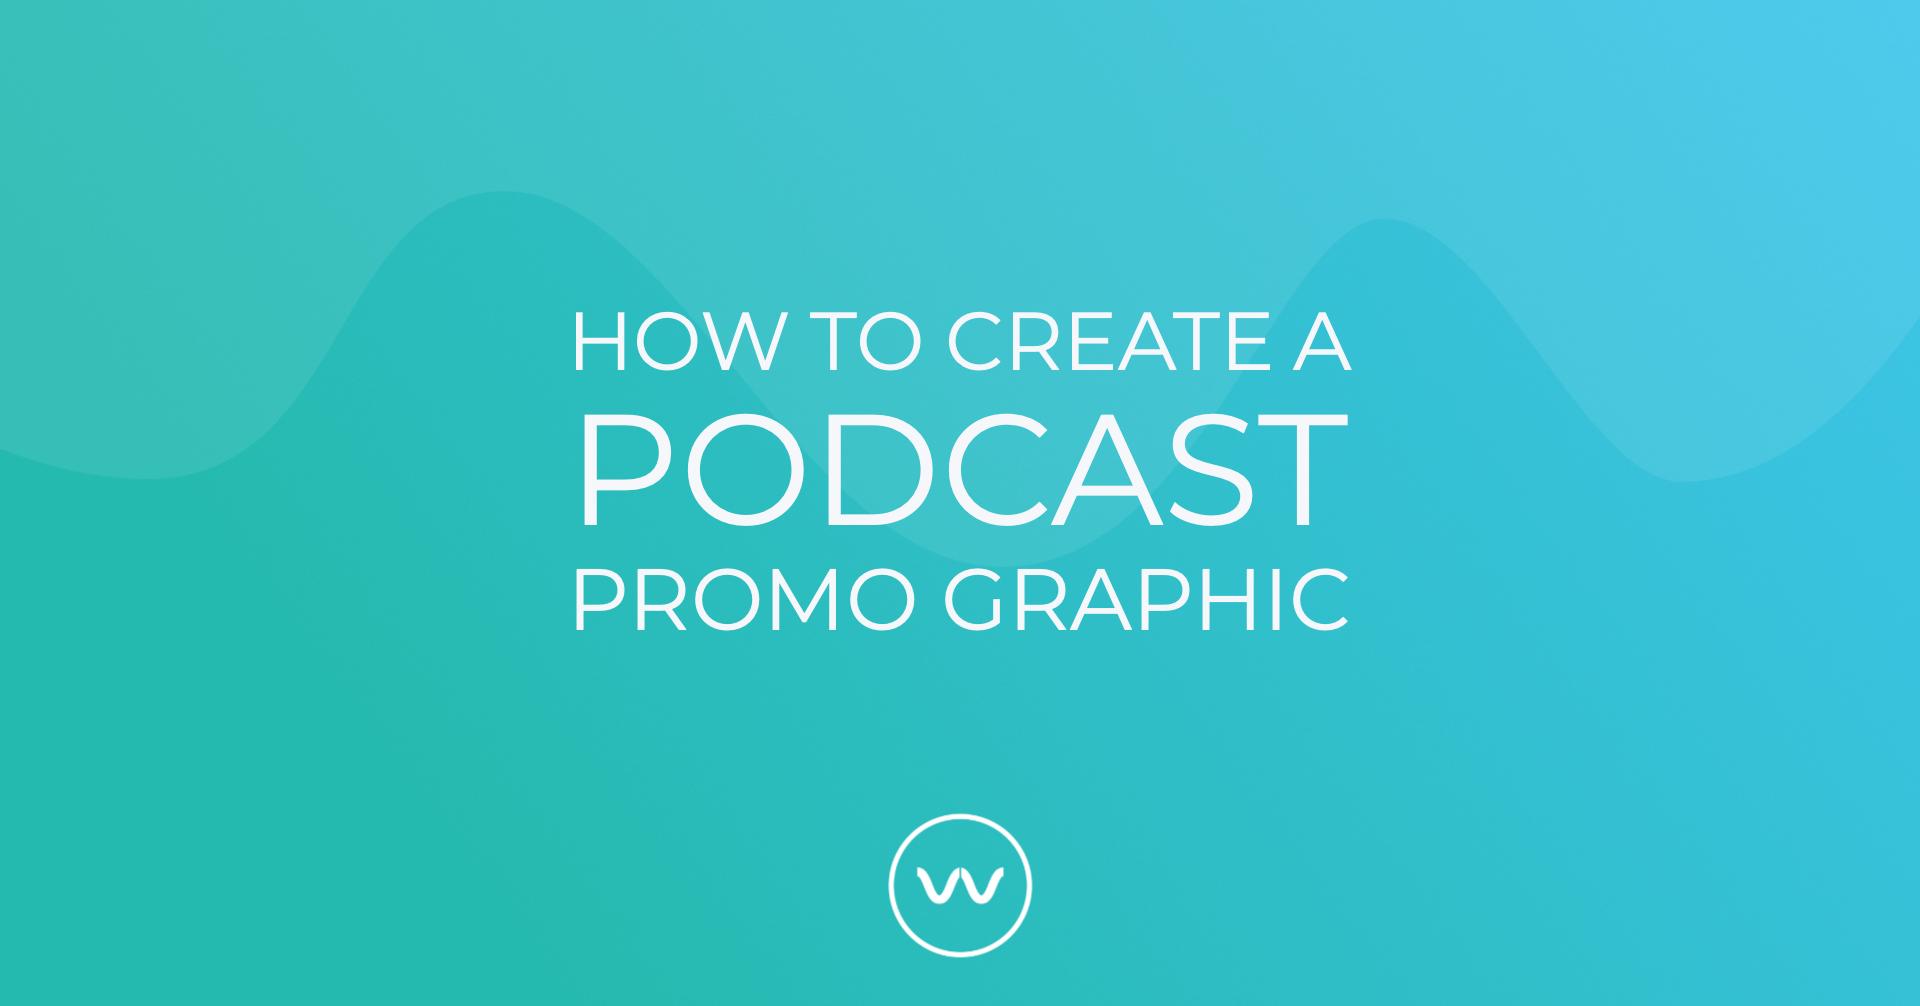 Podcast Promo Graphic